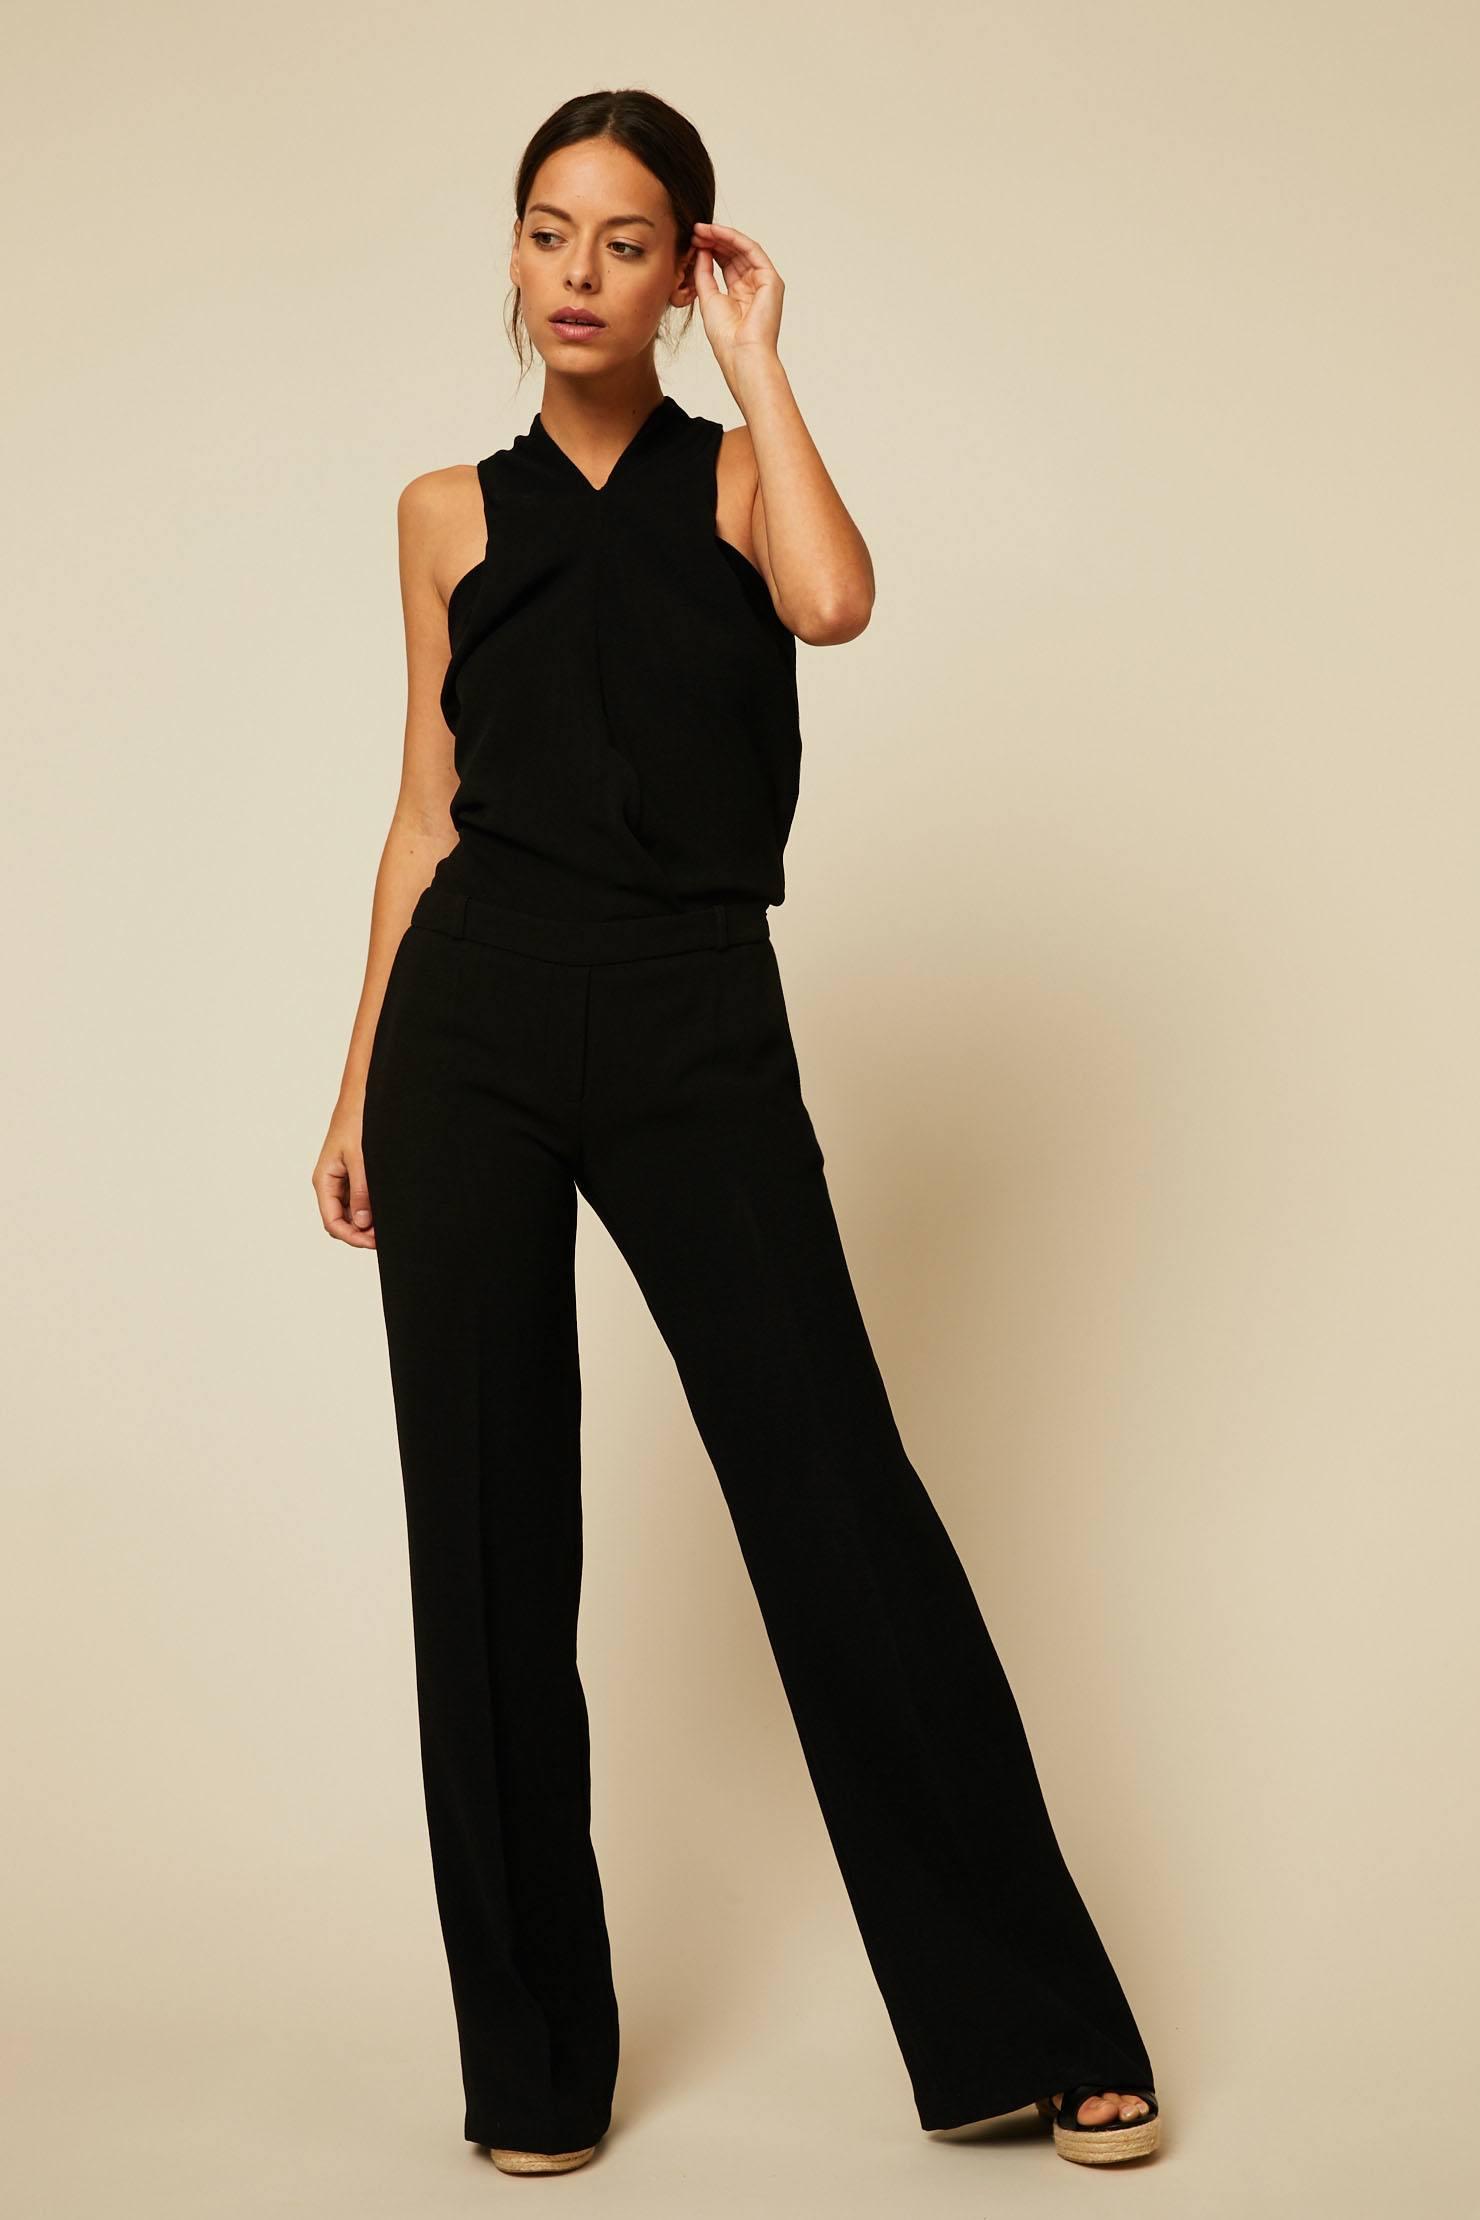 ac721fbc8ac Ba sh Oasis Combi-pantalon dos-nu noir - Combinaison Femme Monshowroom   (Mode)  Monshowroom Ba sh Oasis Combi-pantalon dos-nu noir Ba sh Oasis ...